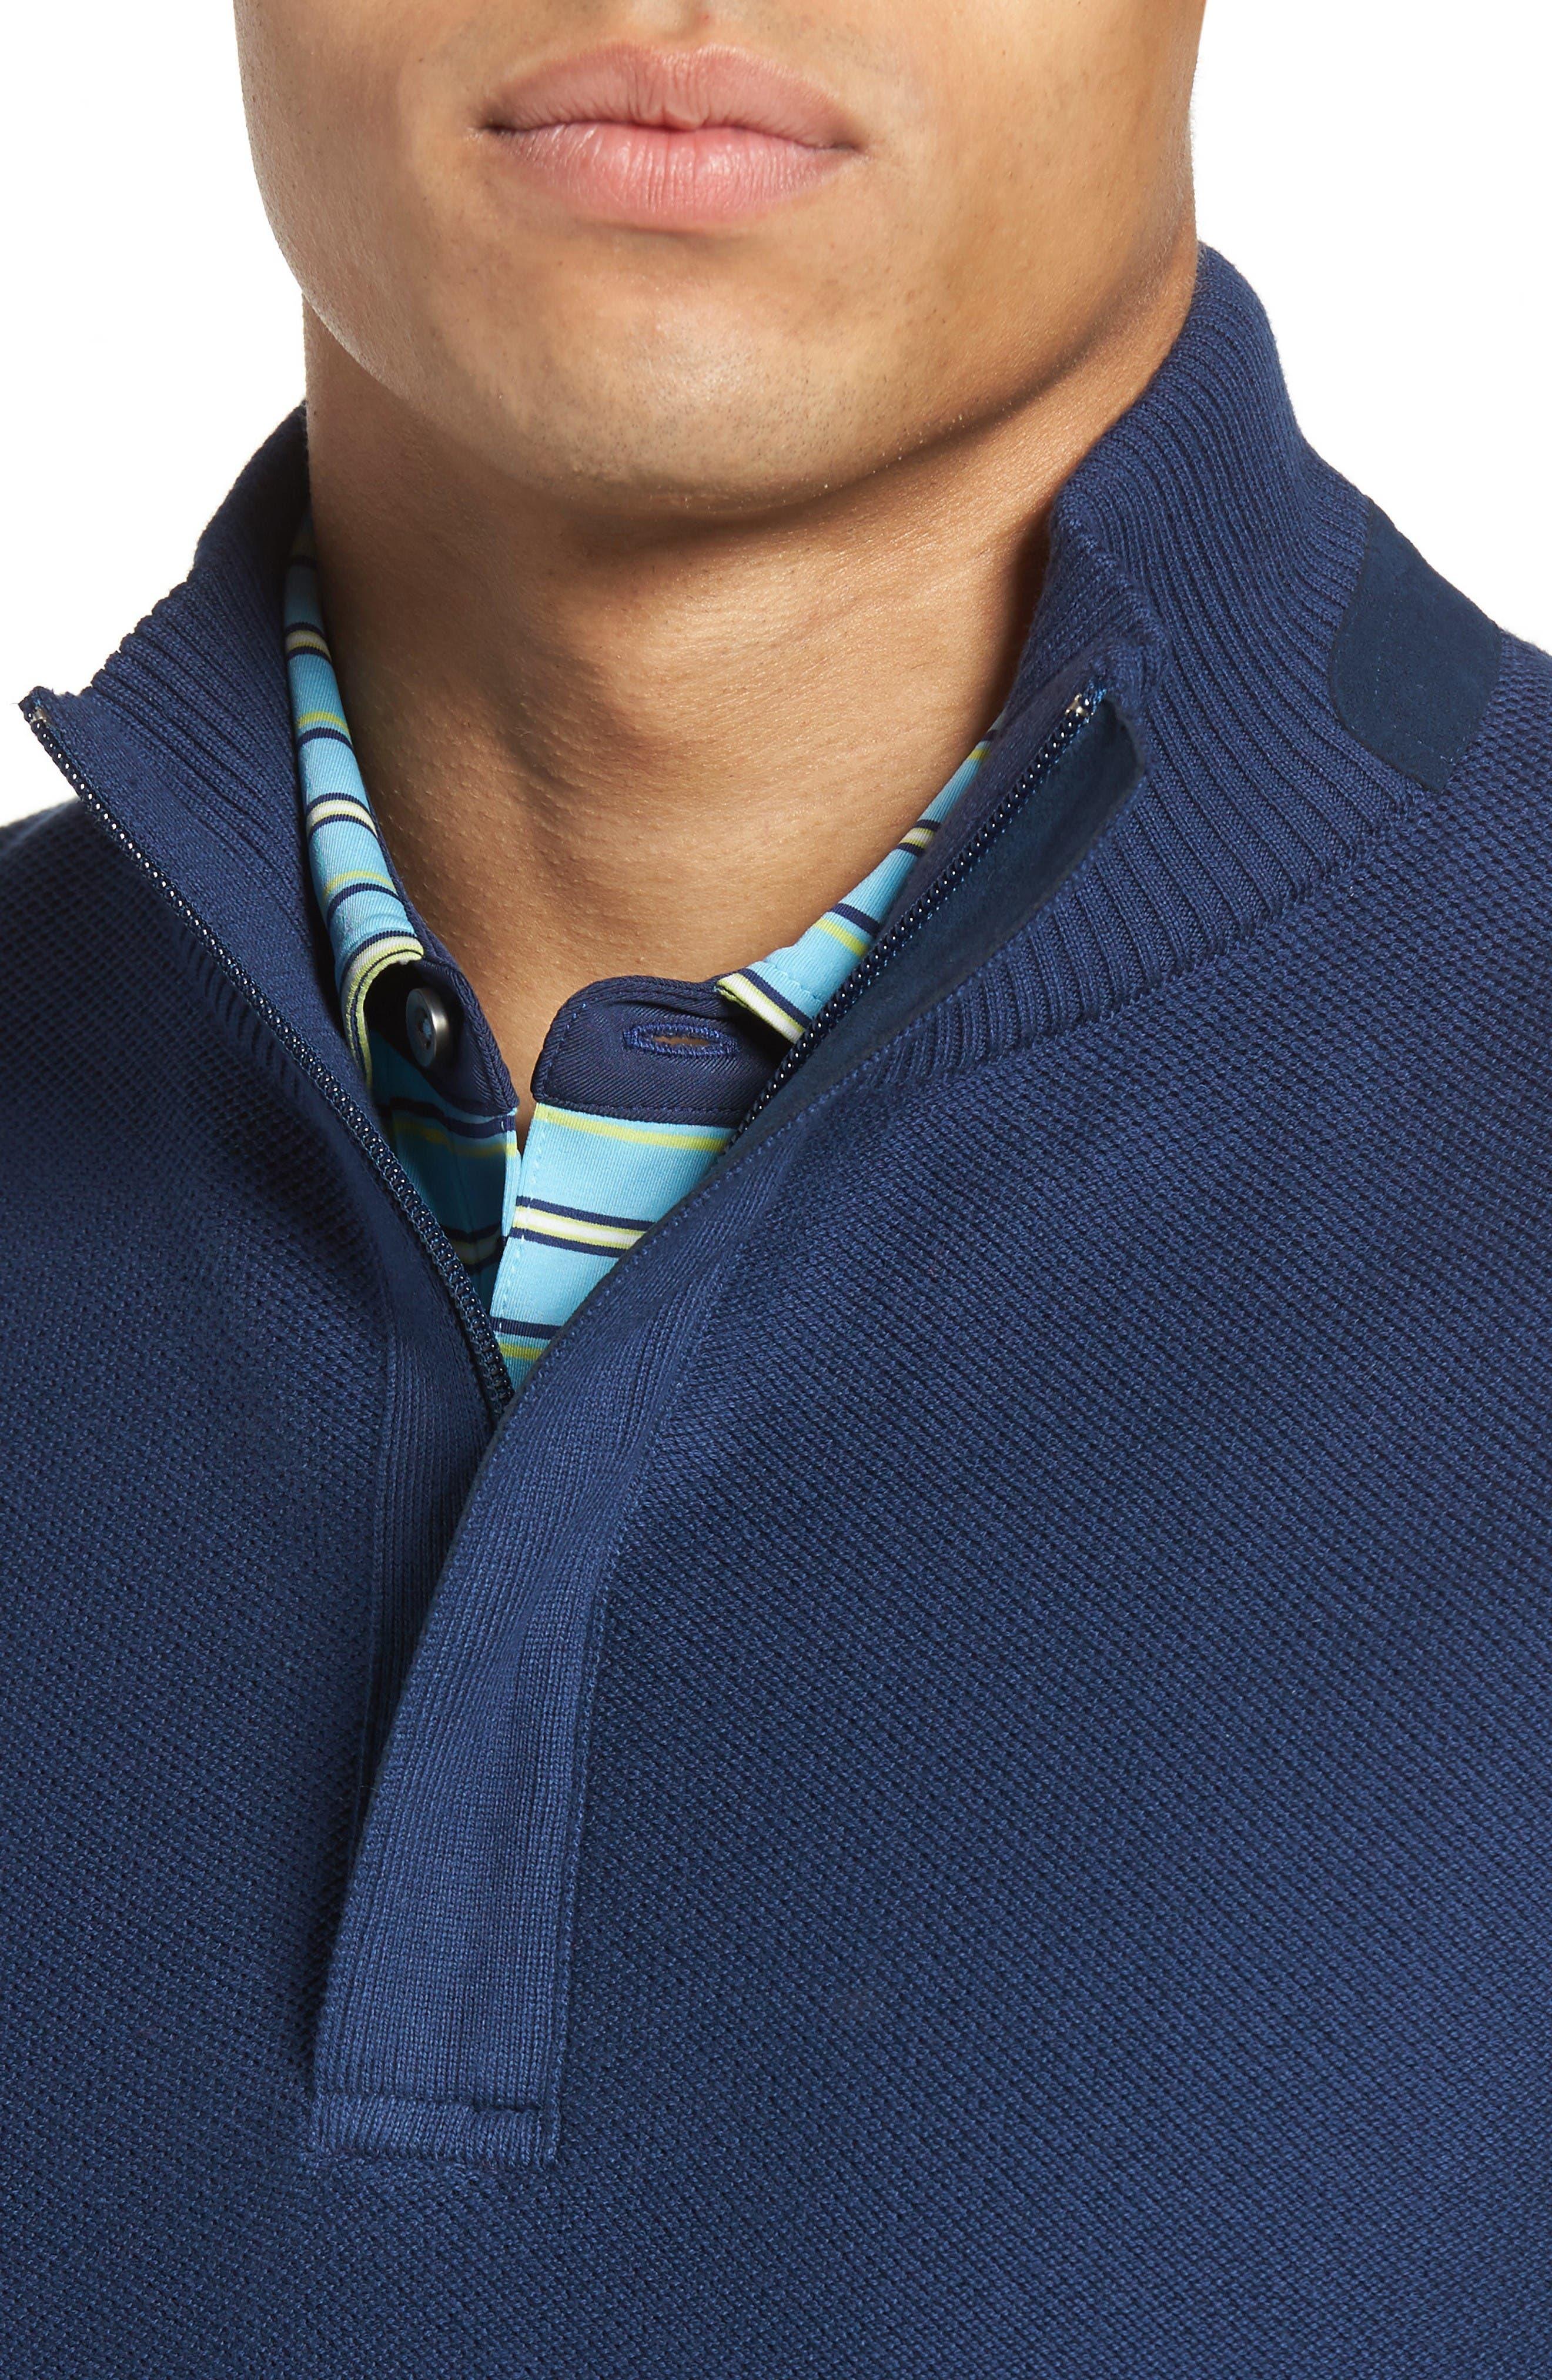 Piqué Jersey Quarter Zip Golf Vest,                             Alternate thumbnail 4, color,                             Summer Navy